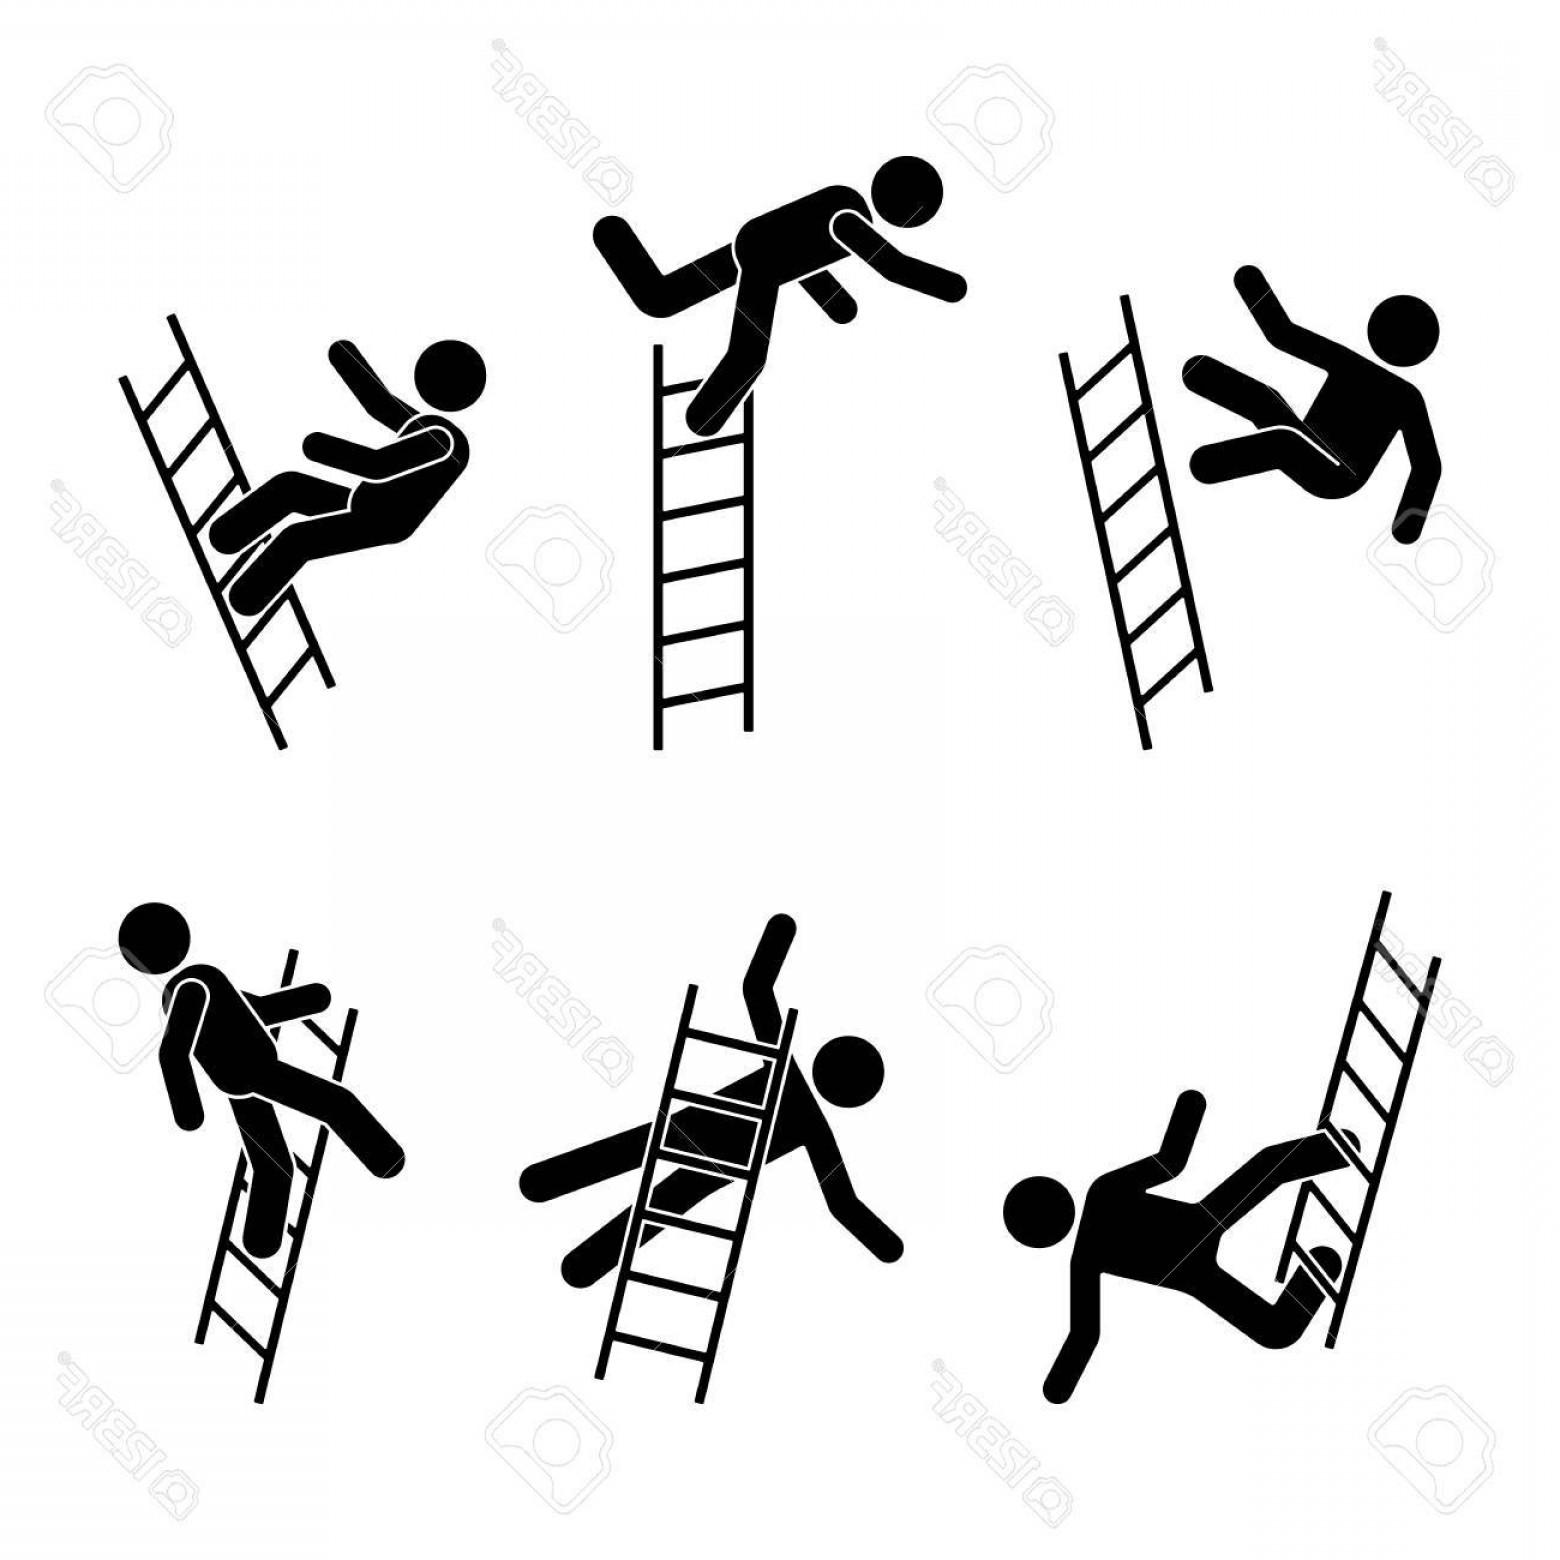 1560x1560 Photostock Vector Man Falling Off A Ladder Stick Figure Pictogram